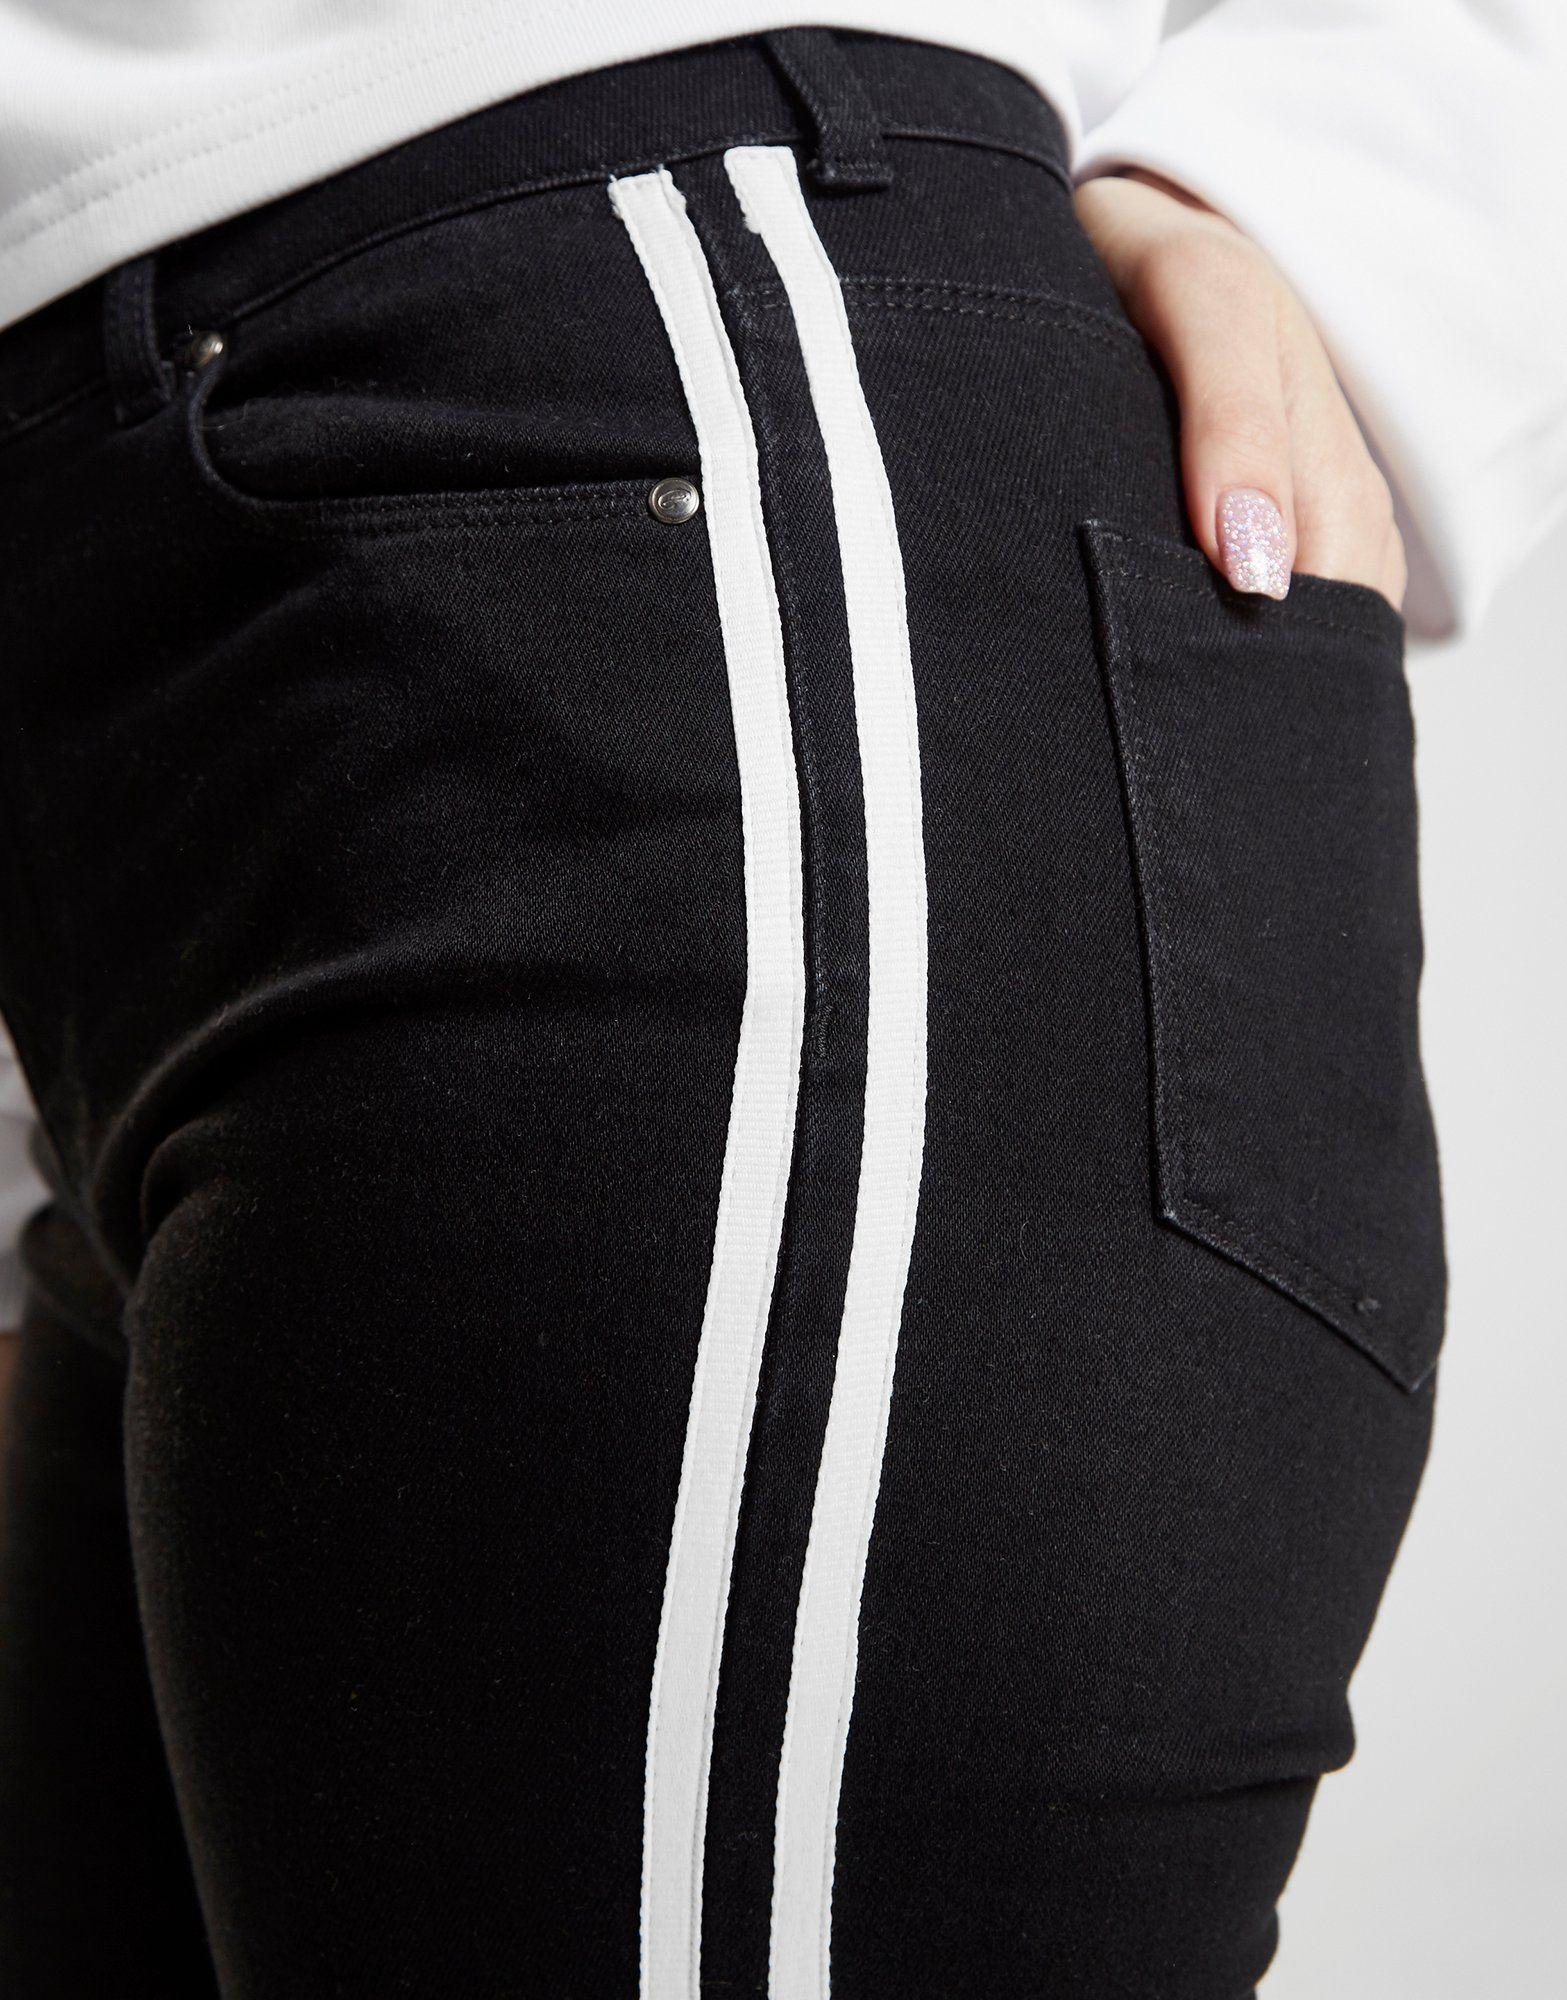 Supply & Demand Sydney High Waisted Jeans